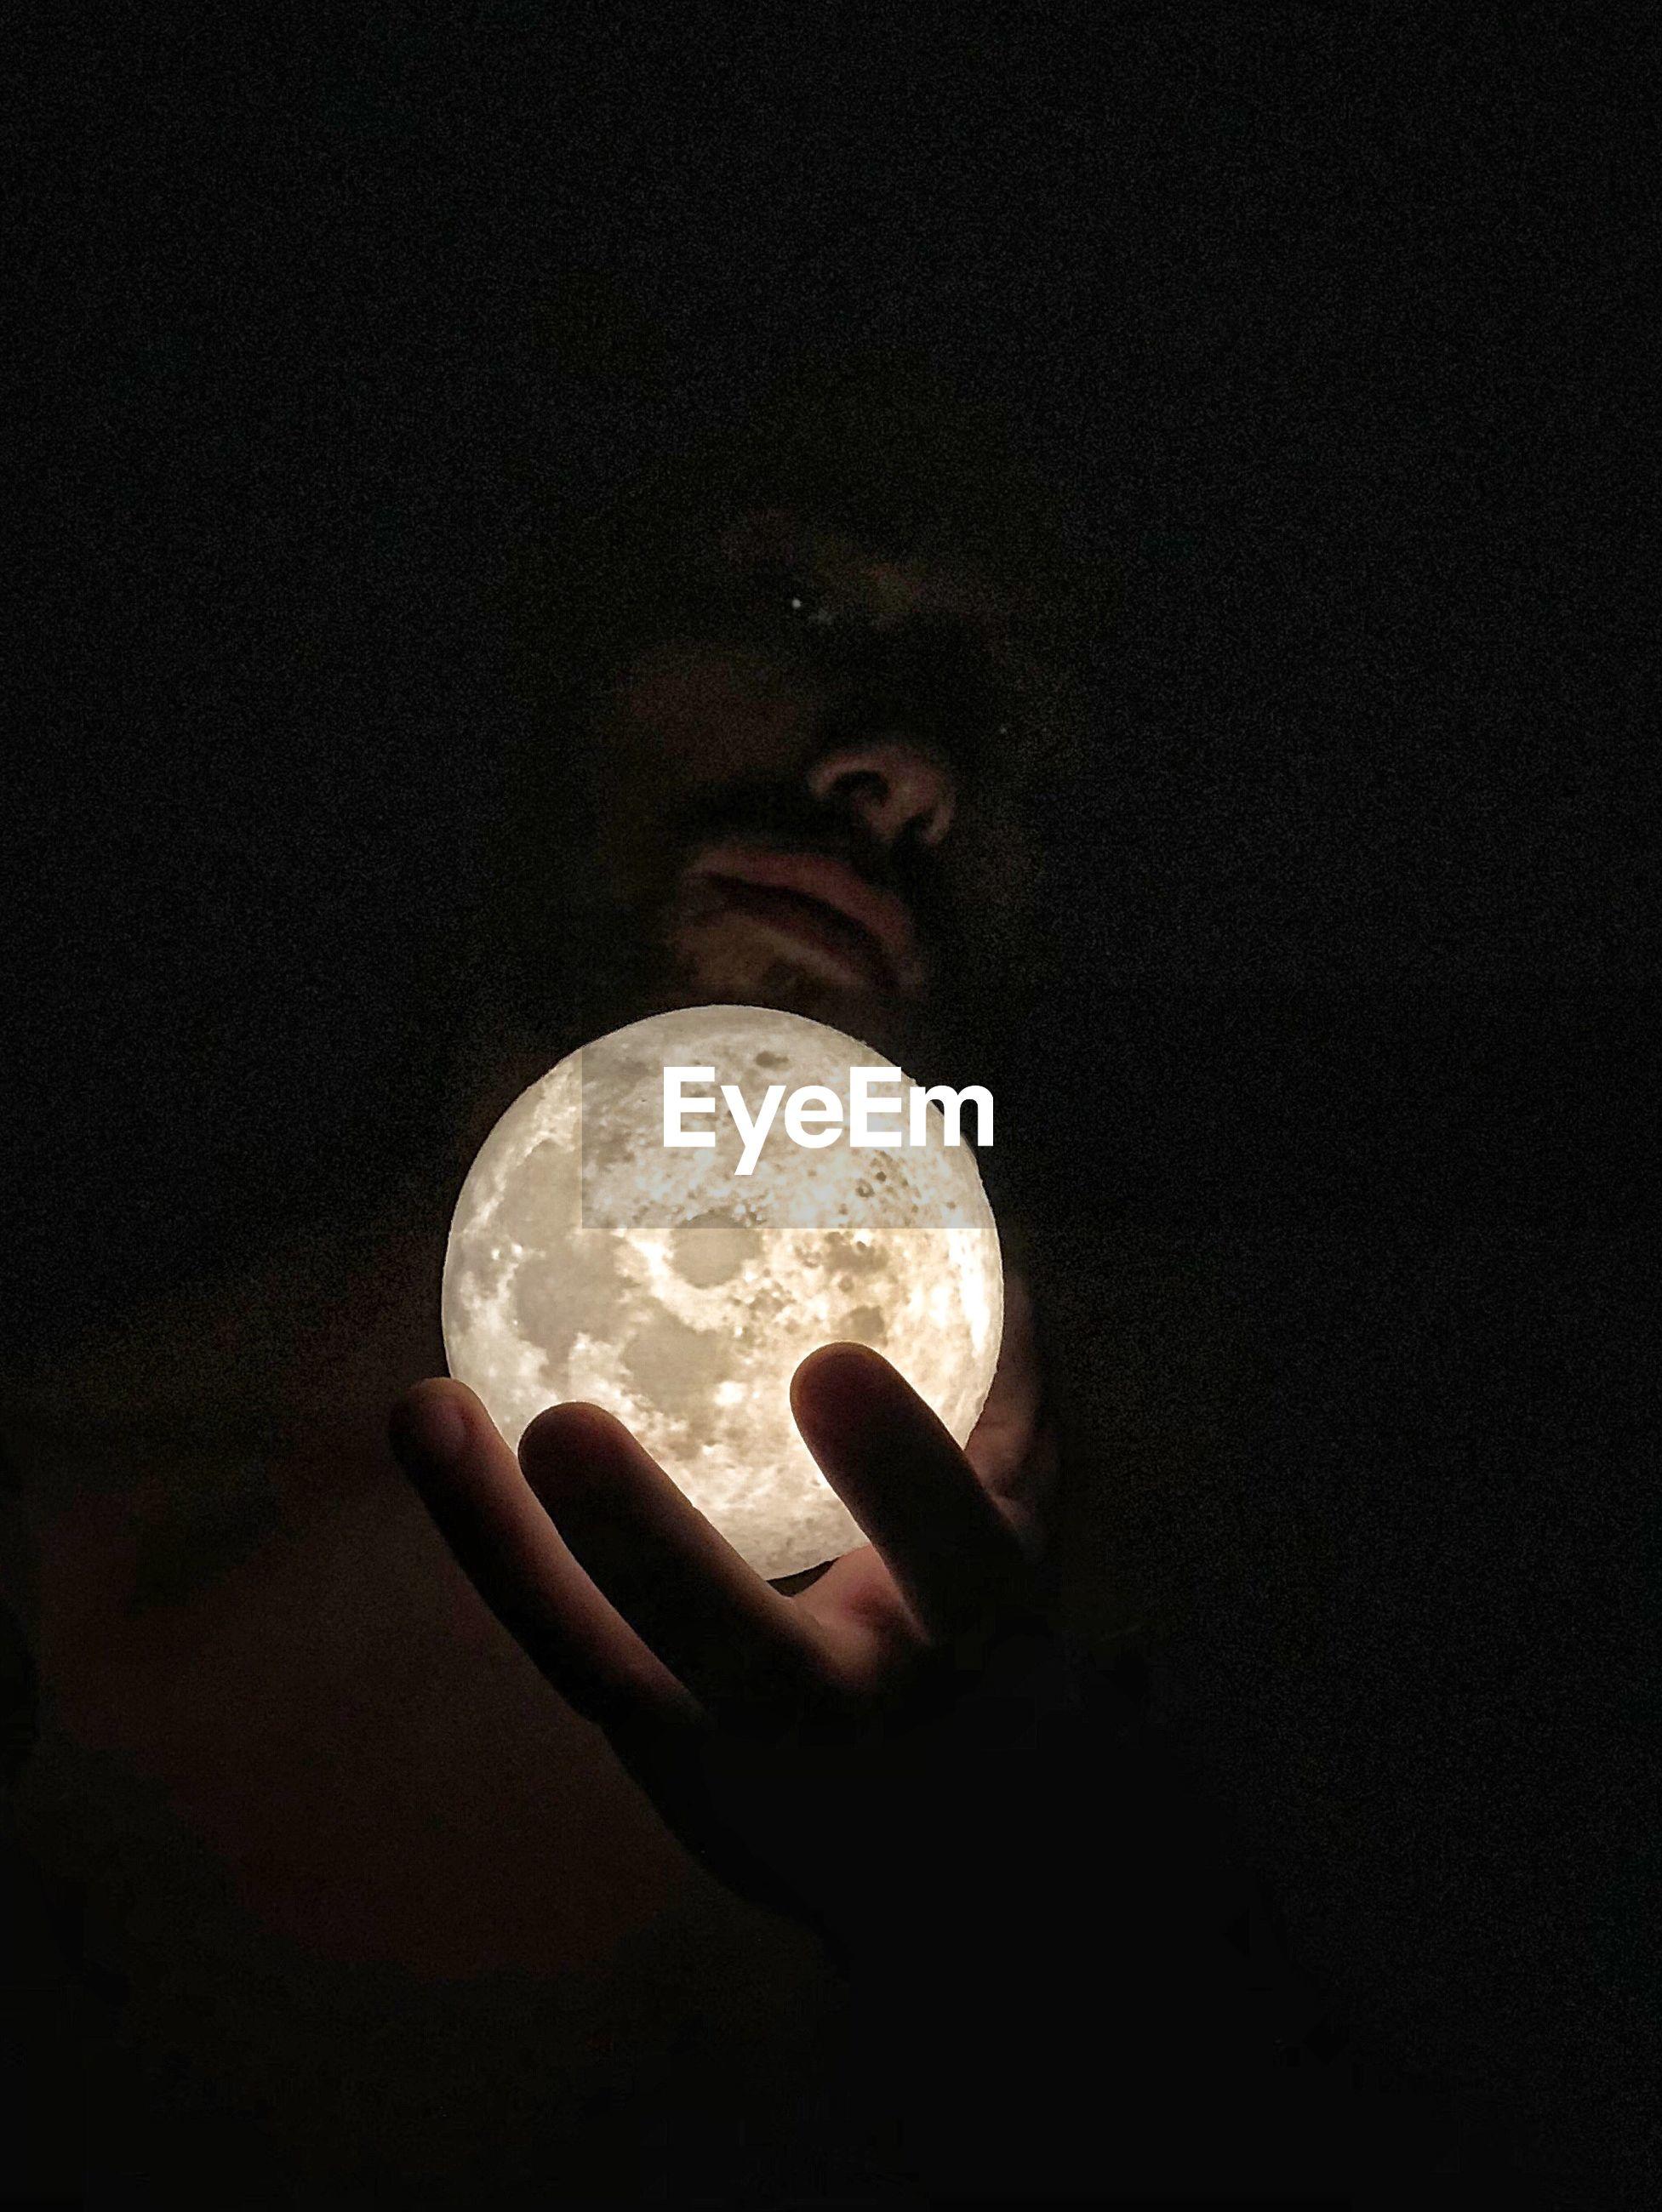 Digital composite image of man holding full moon against black background